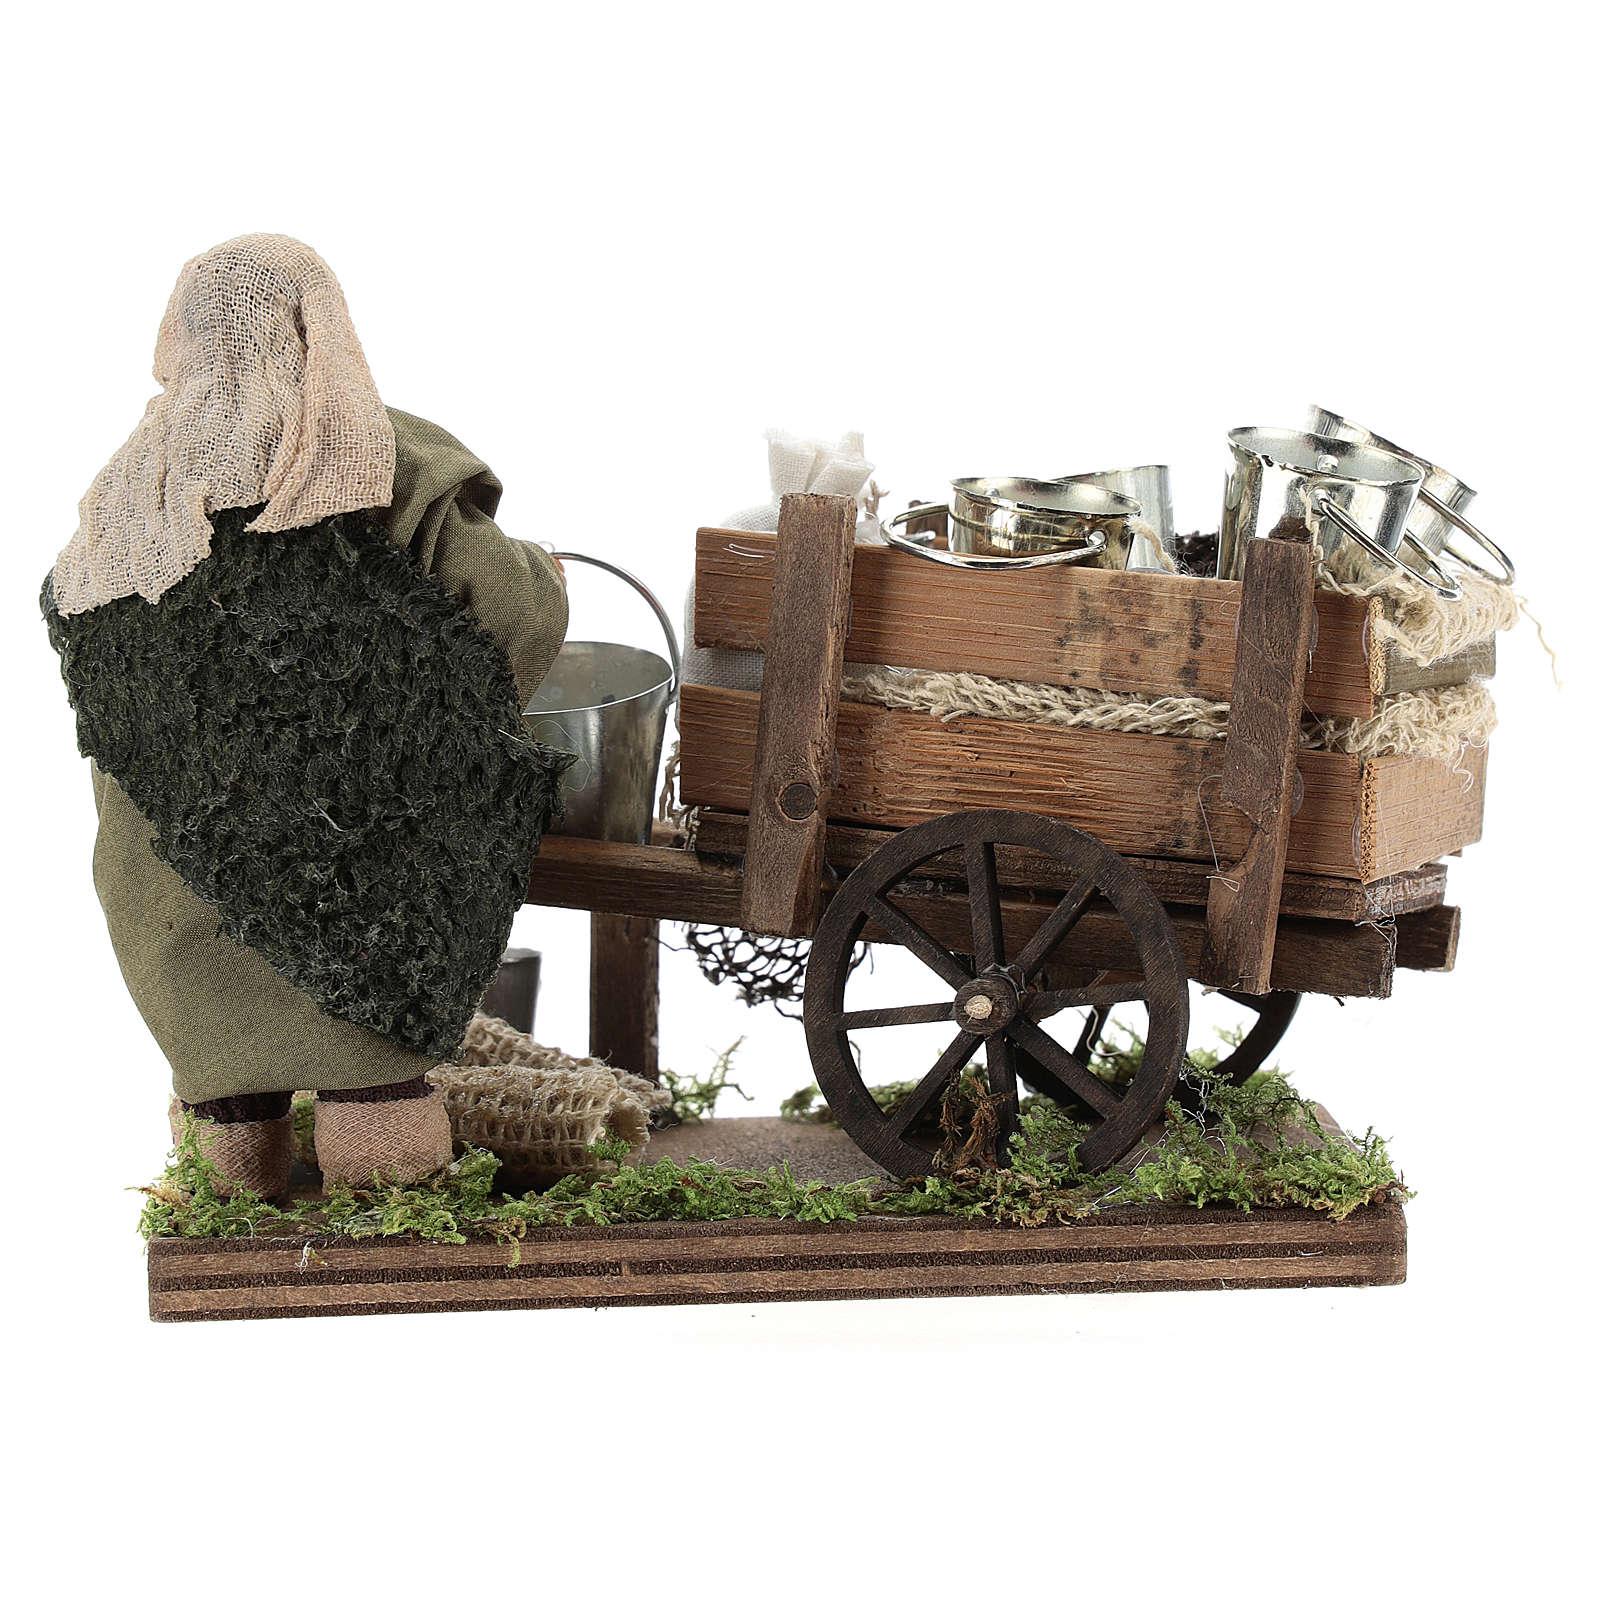 Man with cart of aluminium buckets, Neapolitan nativity figurine 10cm 4